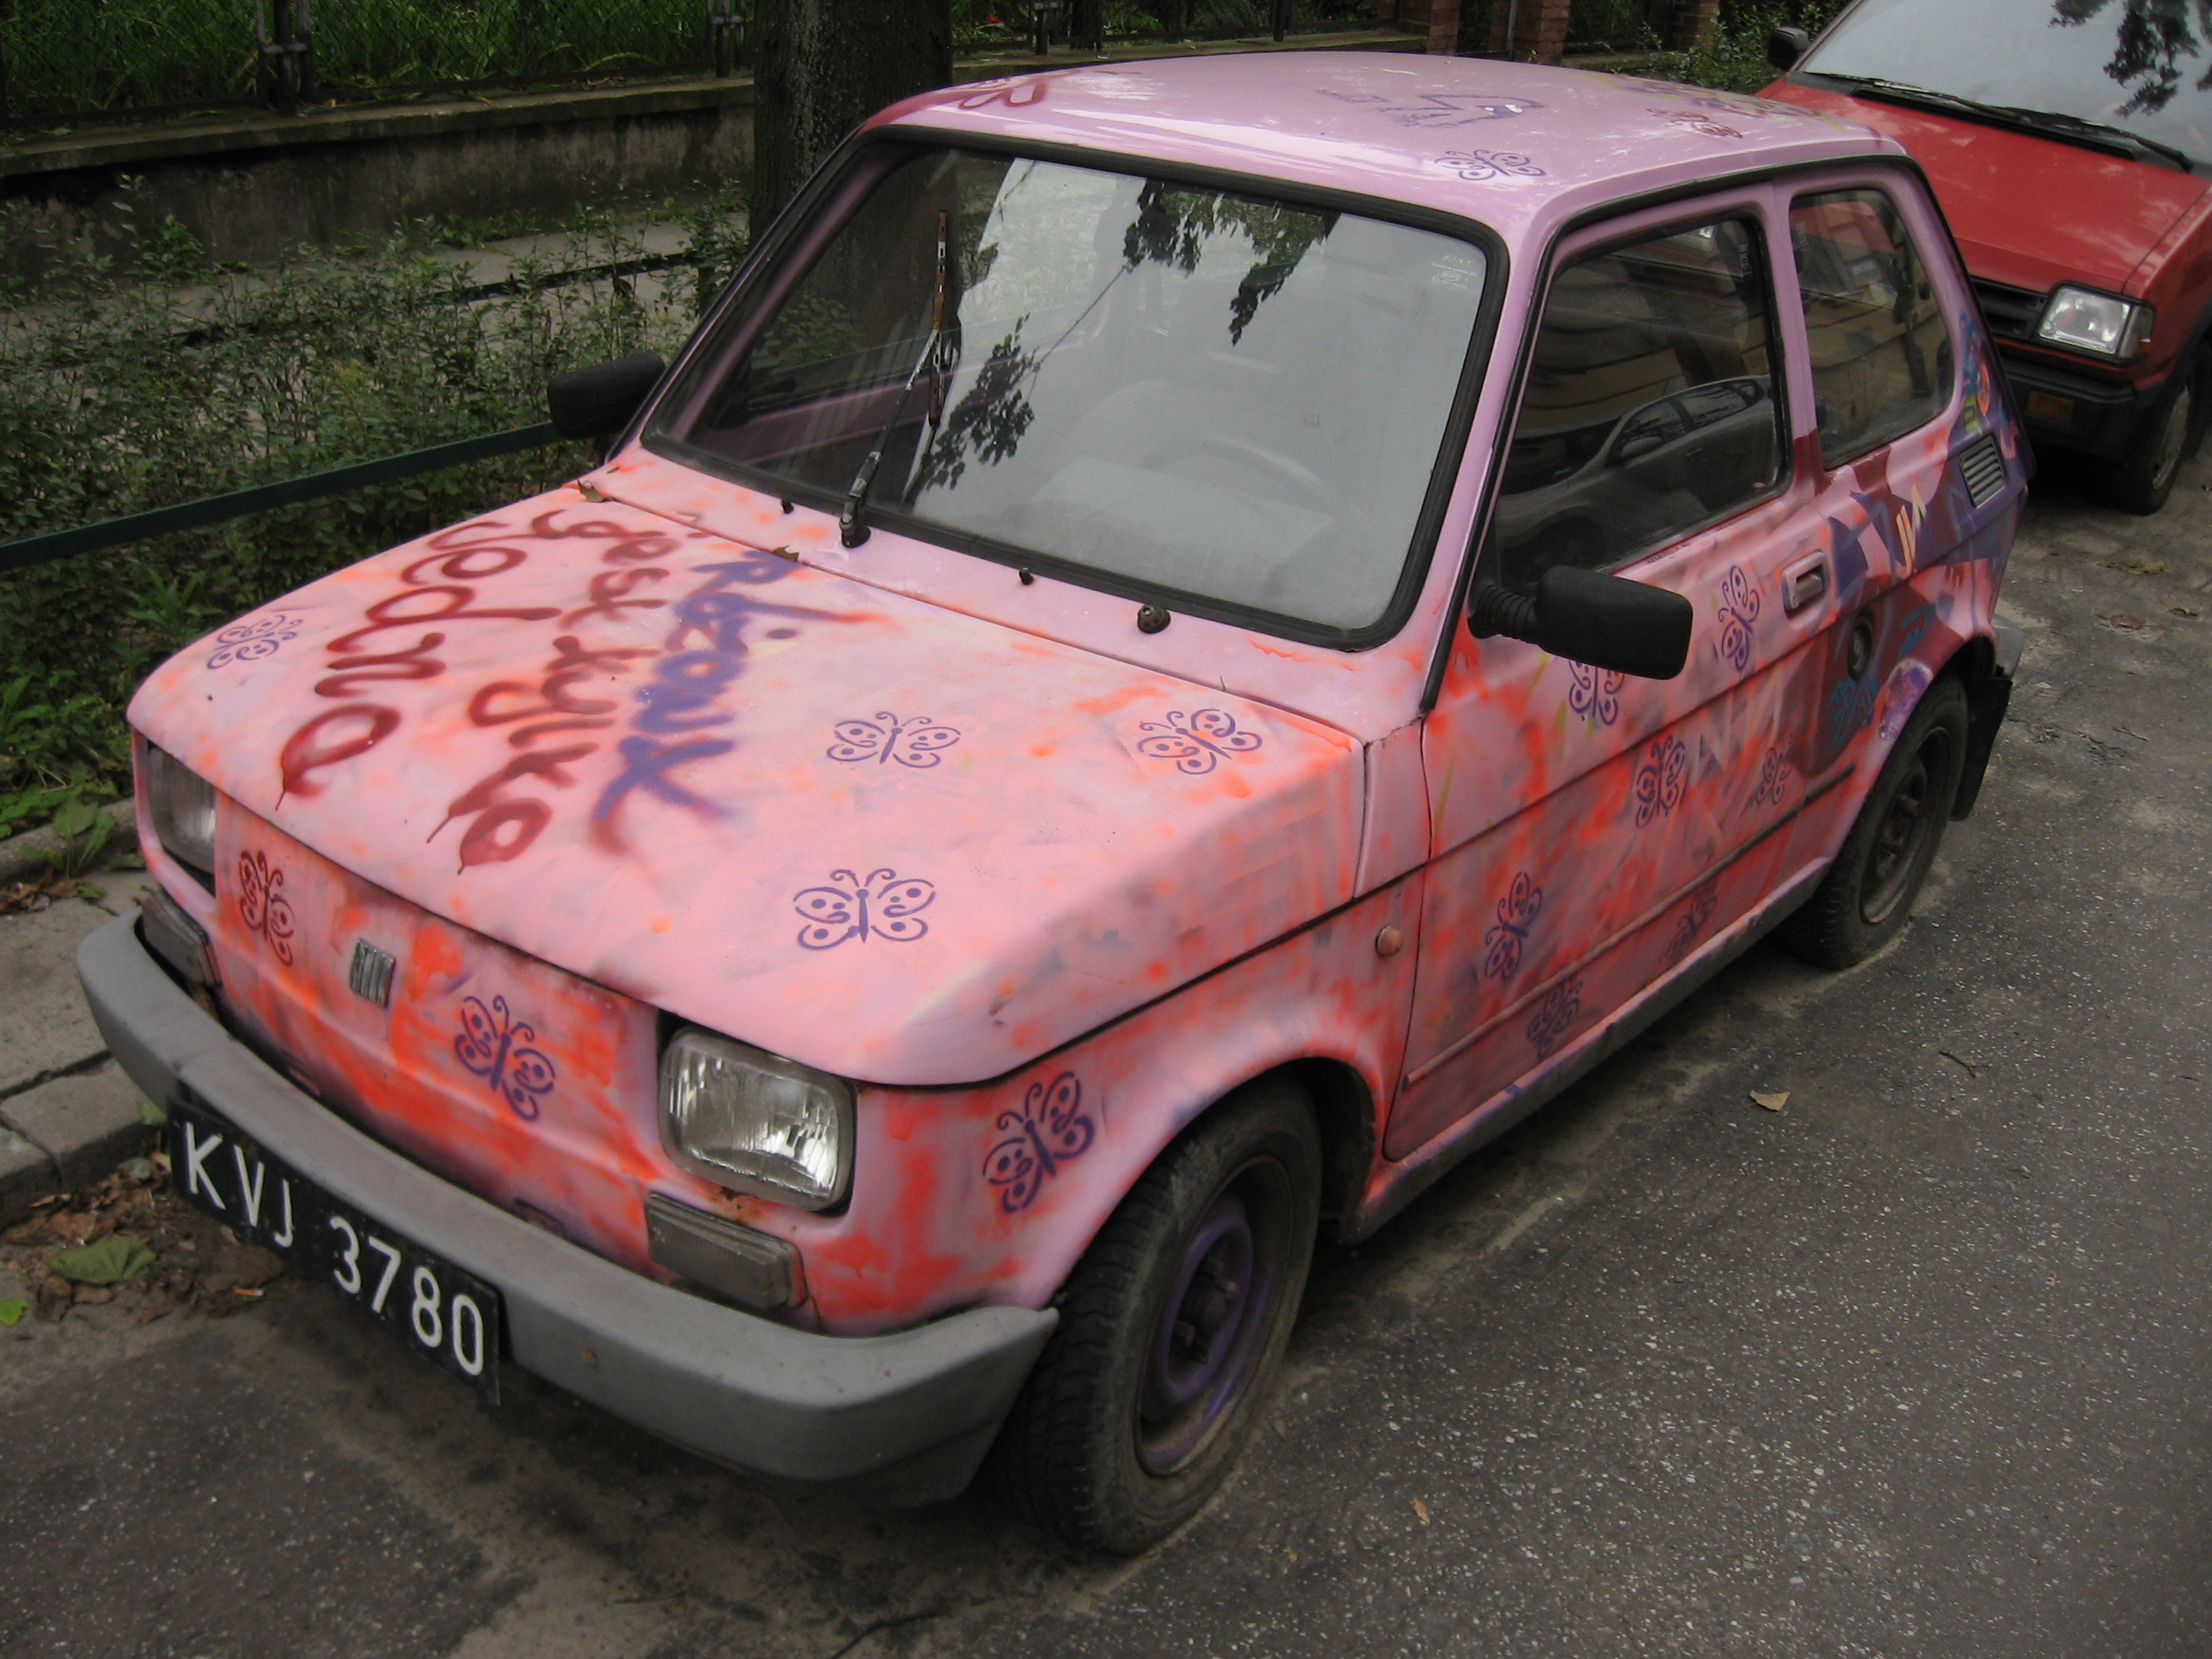 Custom Paint Shops Near Me >> File Fiat 126 Elx With A Custom Paintjob In Krakow 2 Jpg